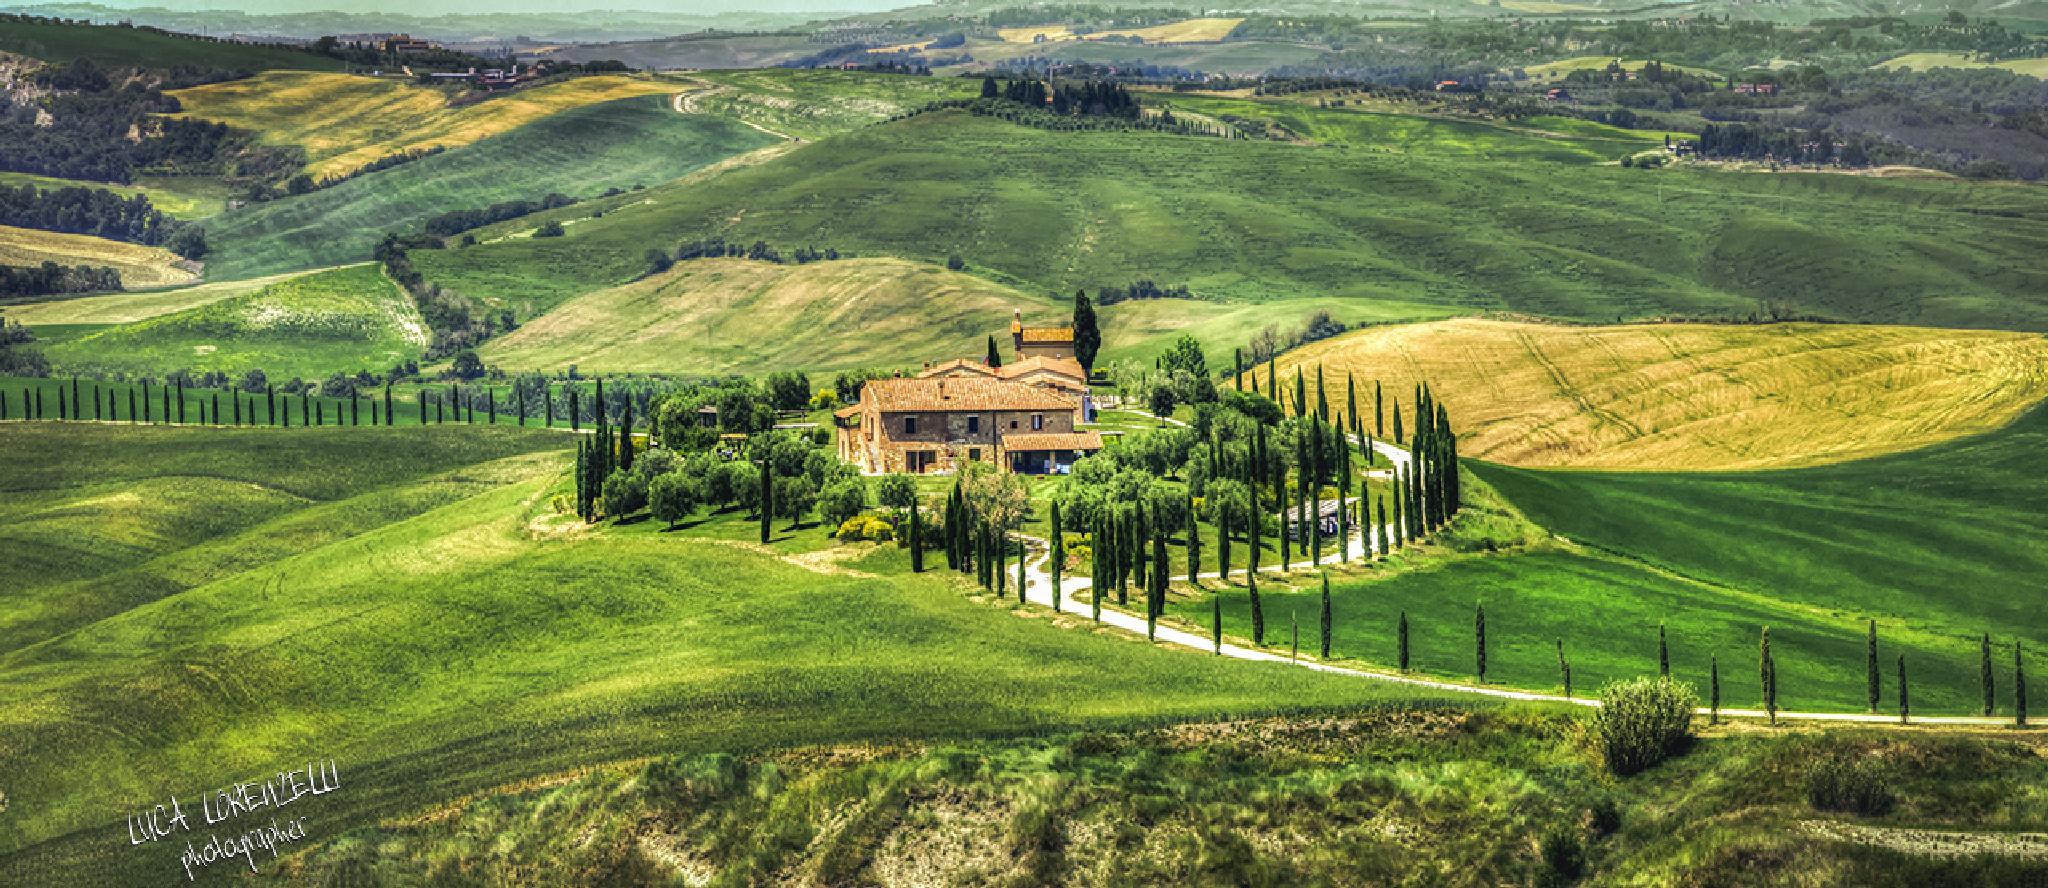 Tuscany hills - Crete Senesi - Italy by Luca Lorenzelli